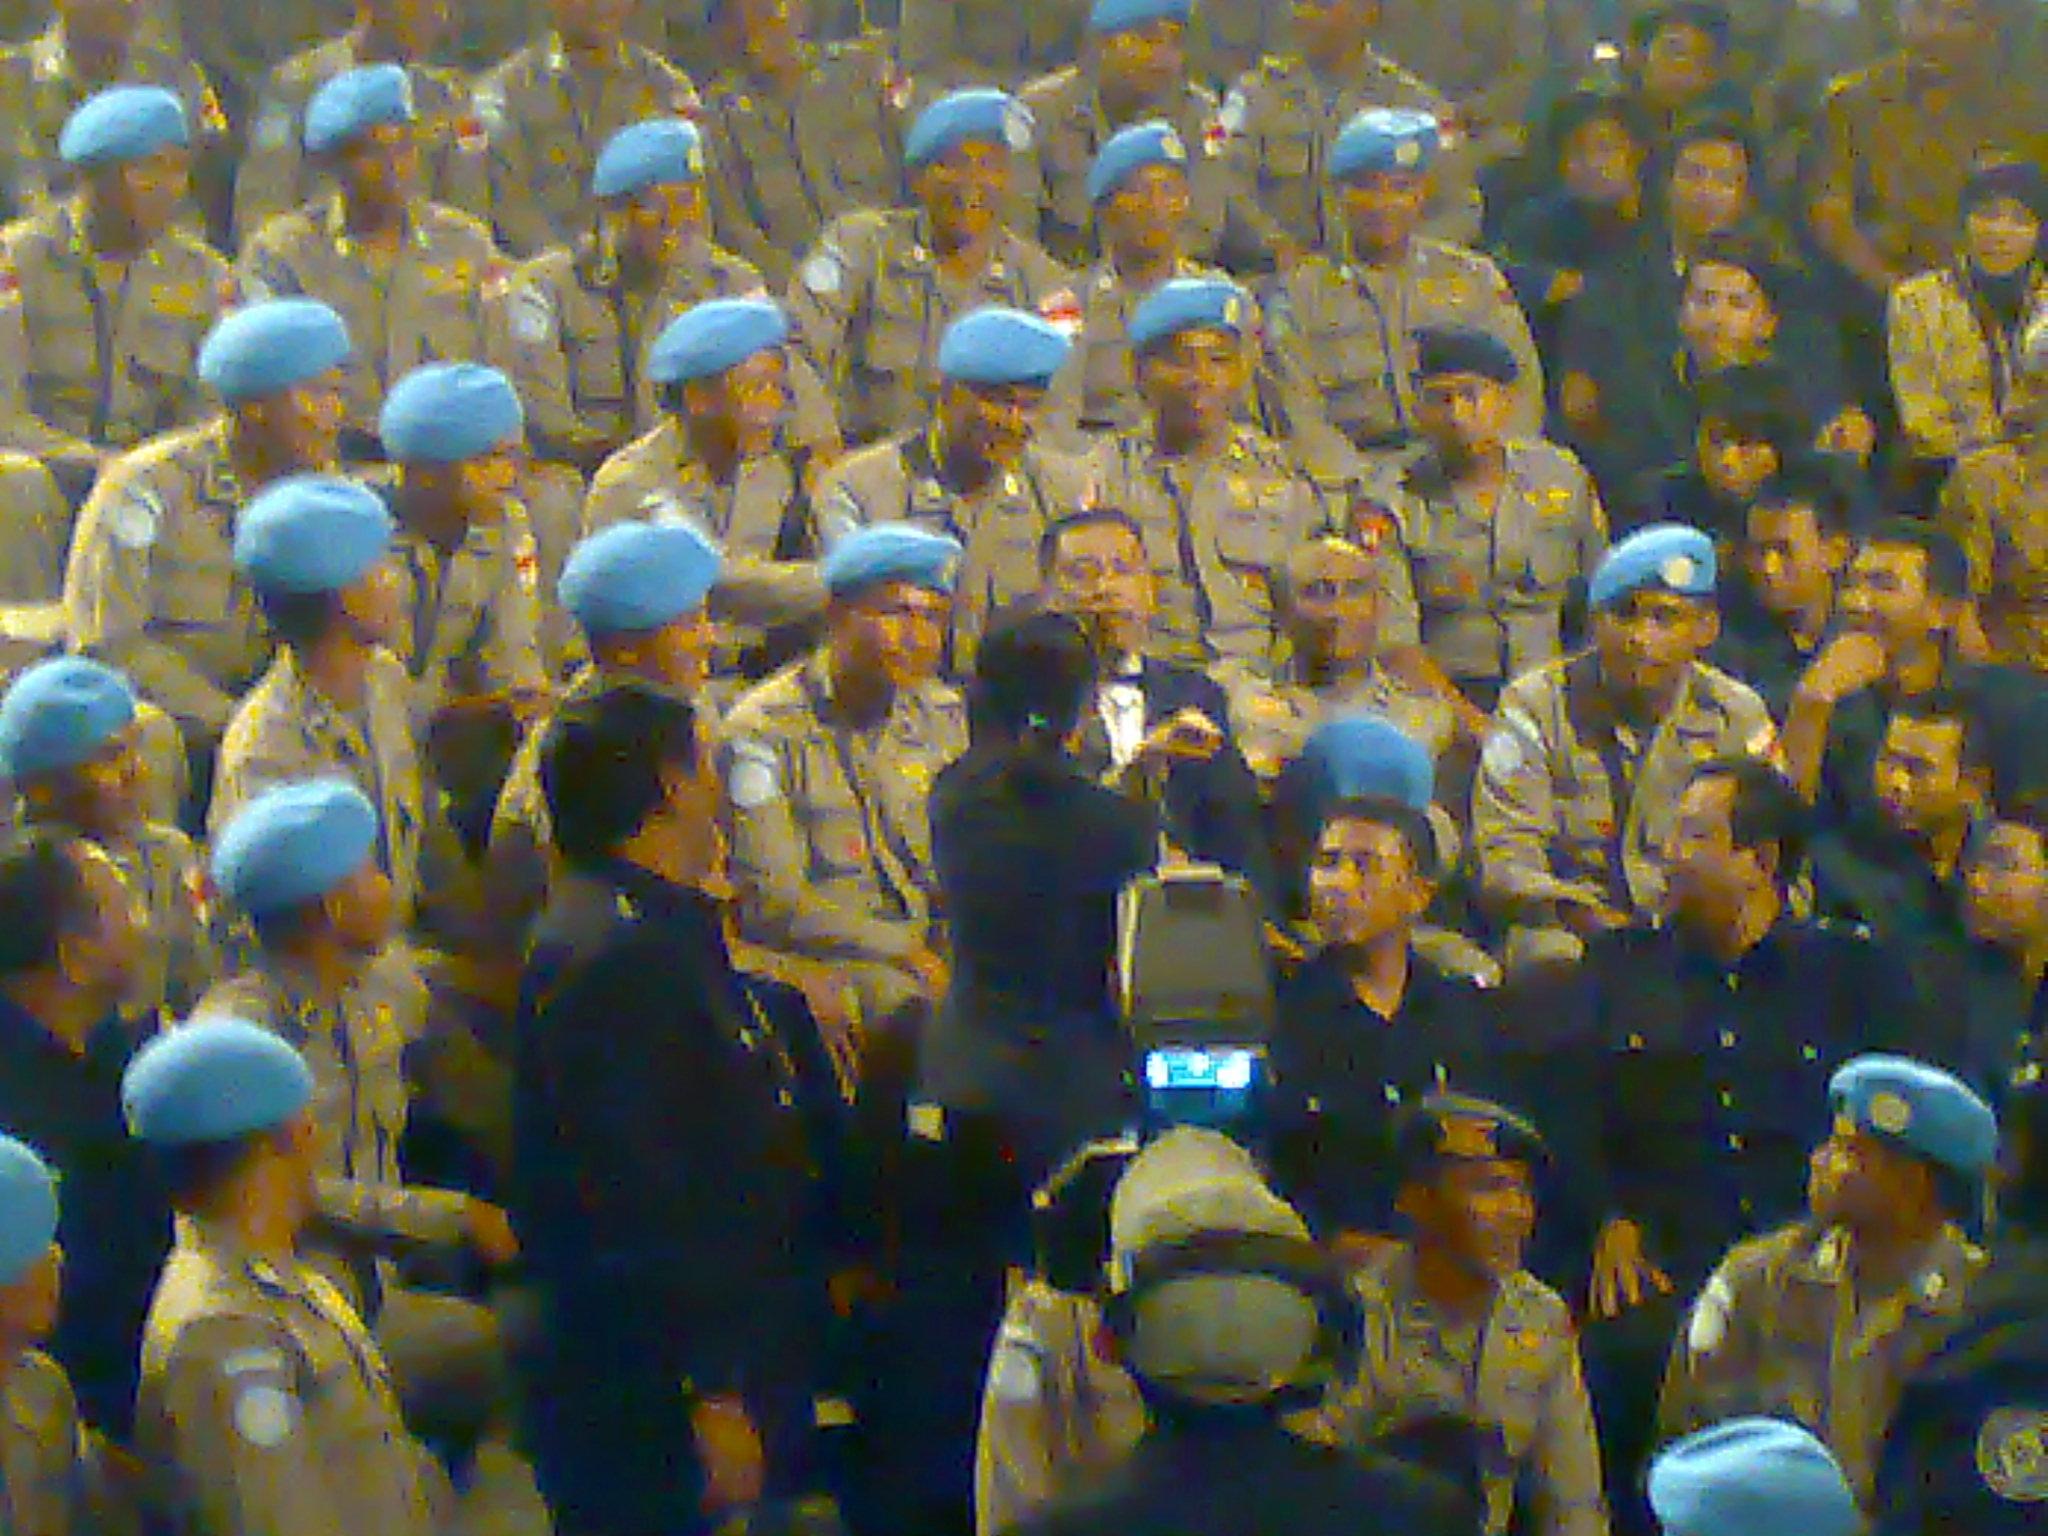 Tukul and FPU Indonesia